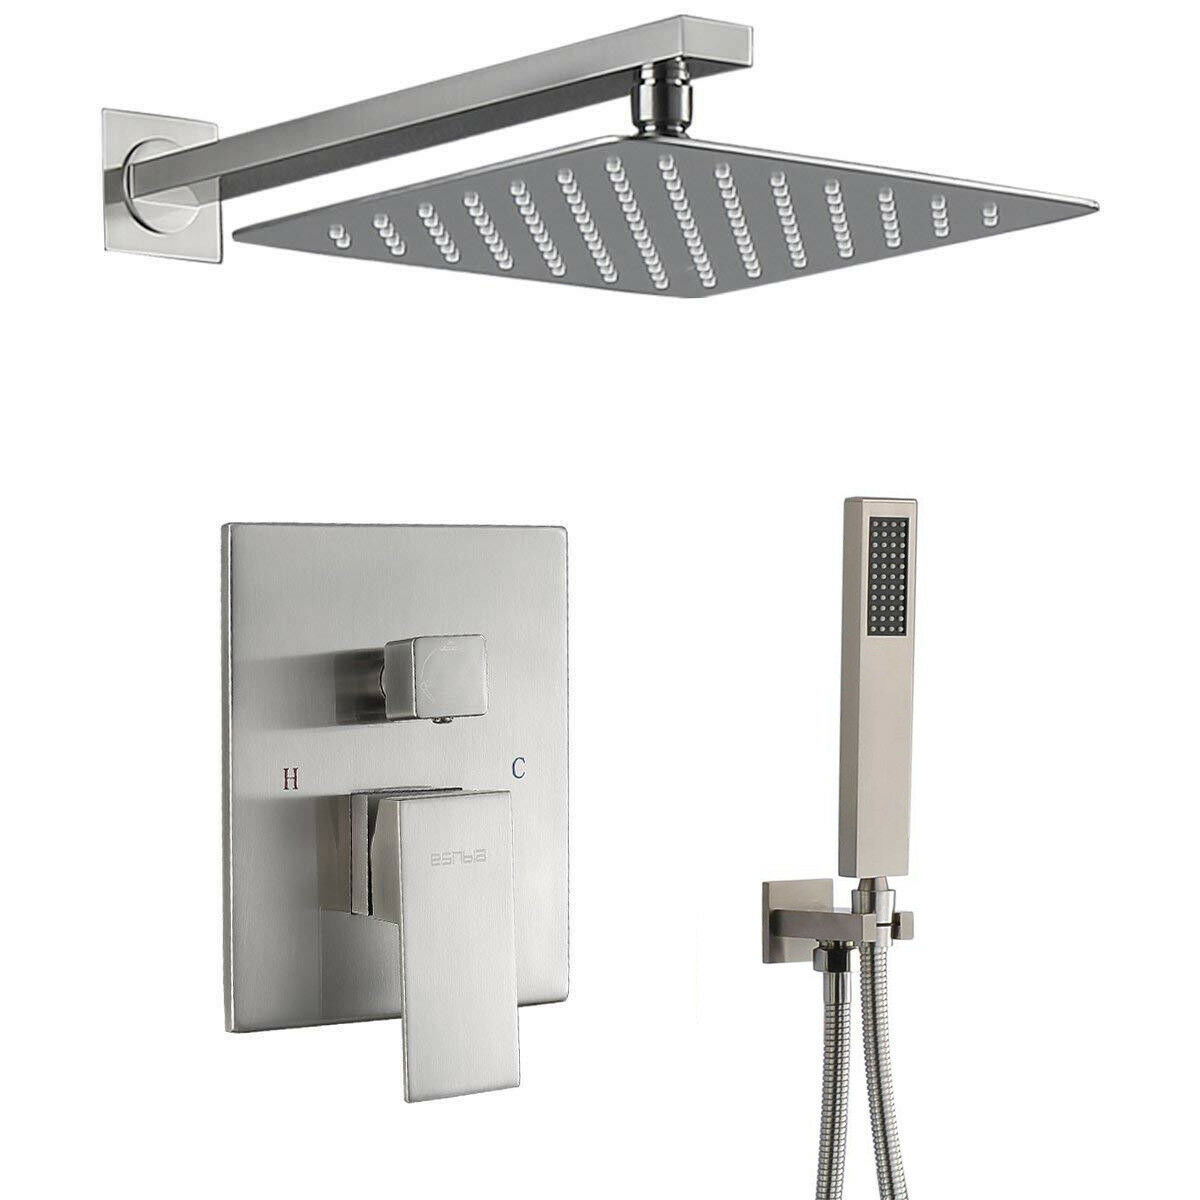 8-inch Bathroom Rainfall Brass Shower Faucet Set Mixer Valve Tap Brushed Nickel